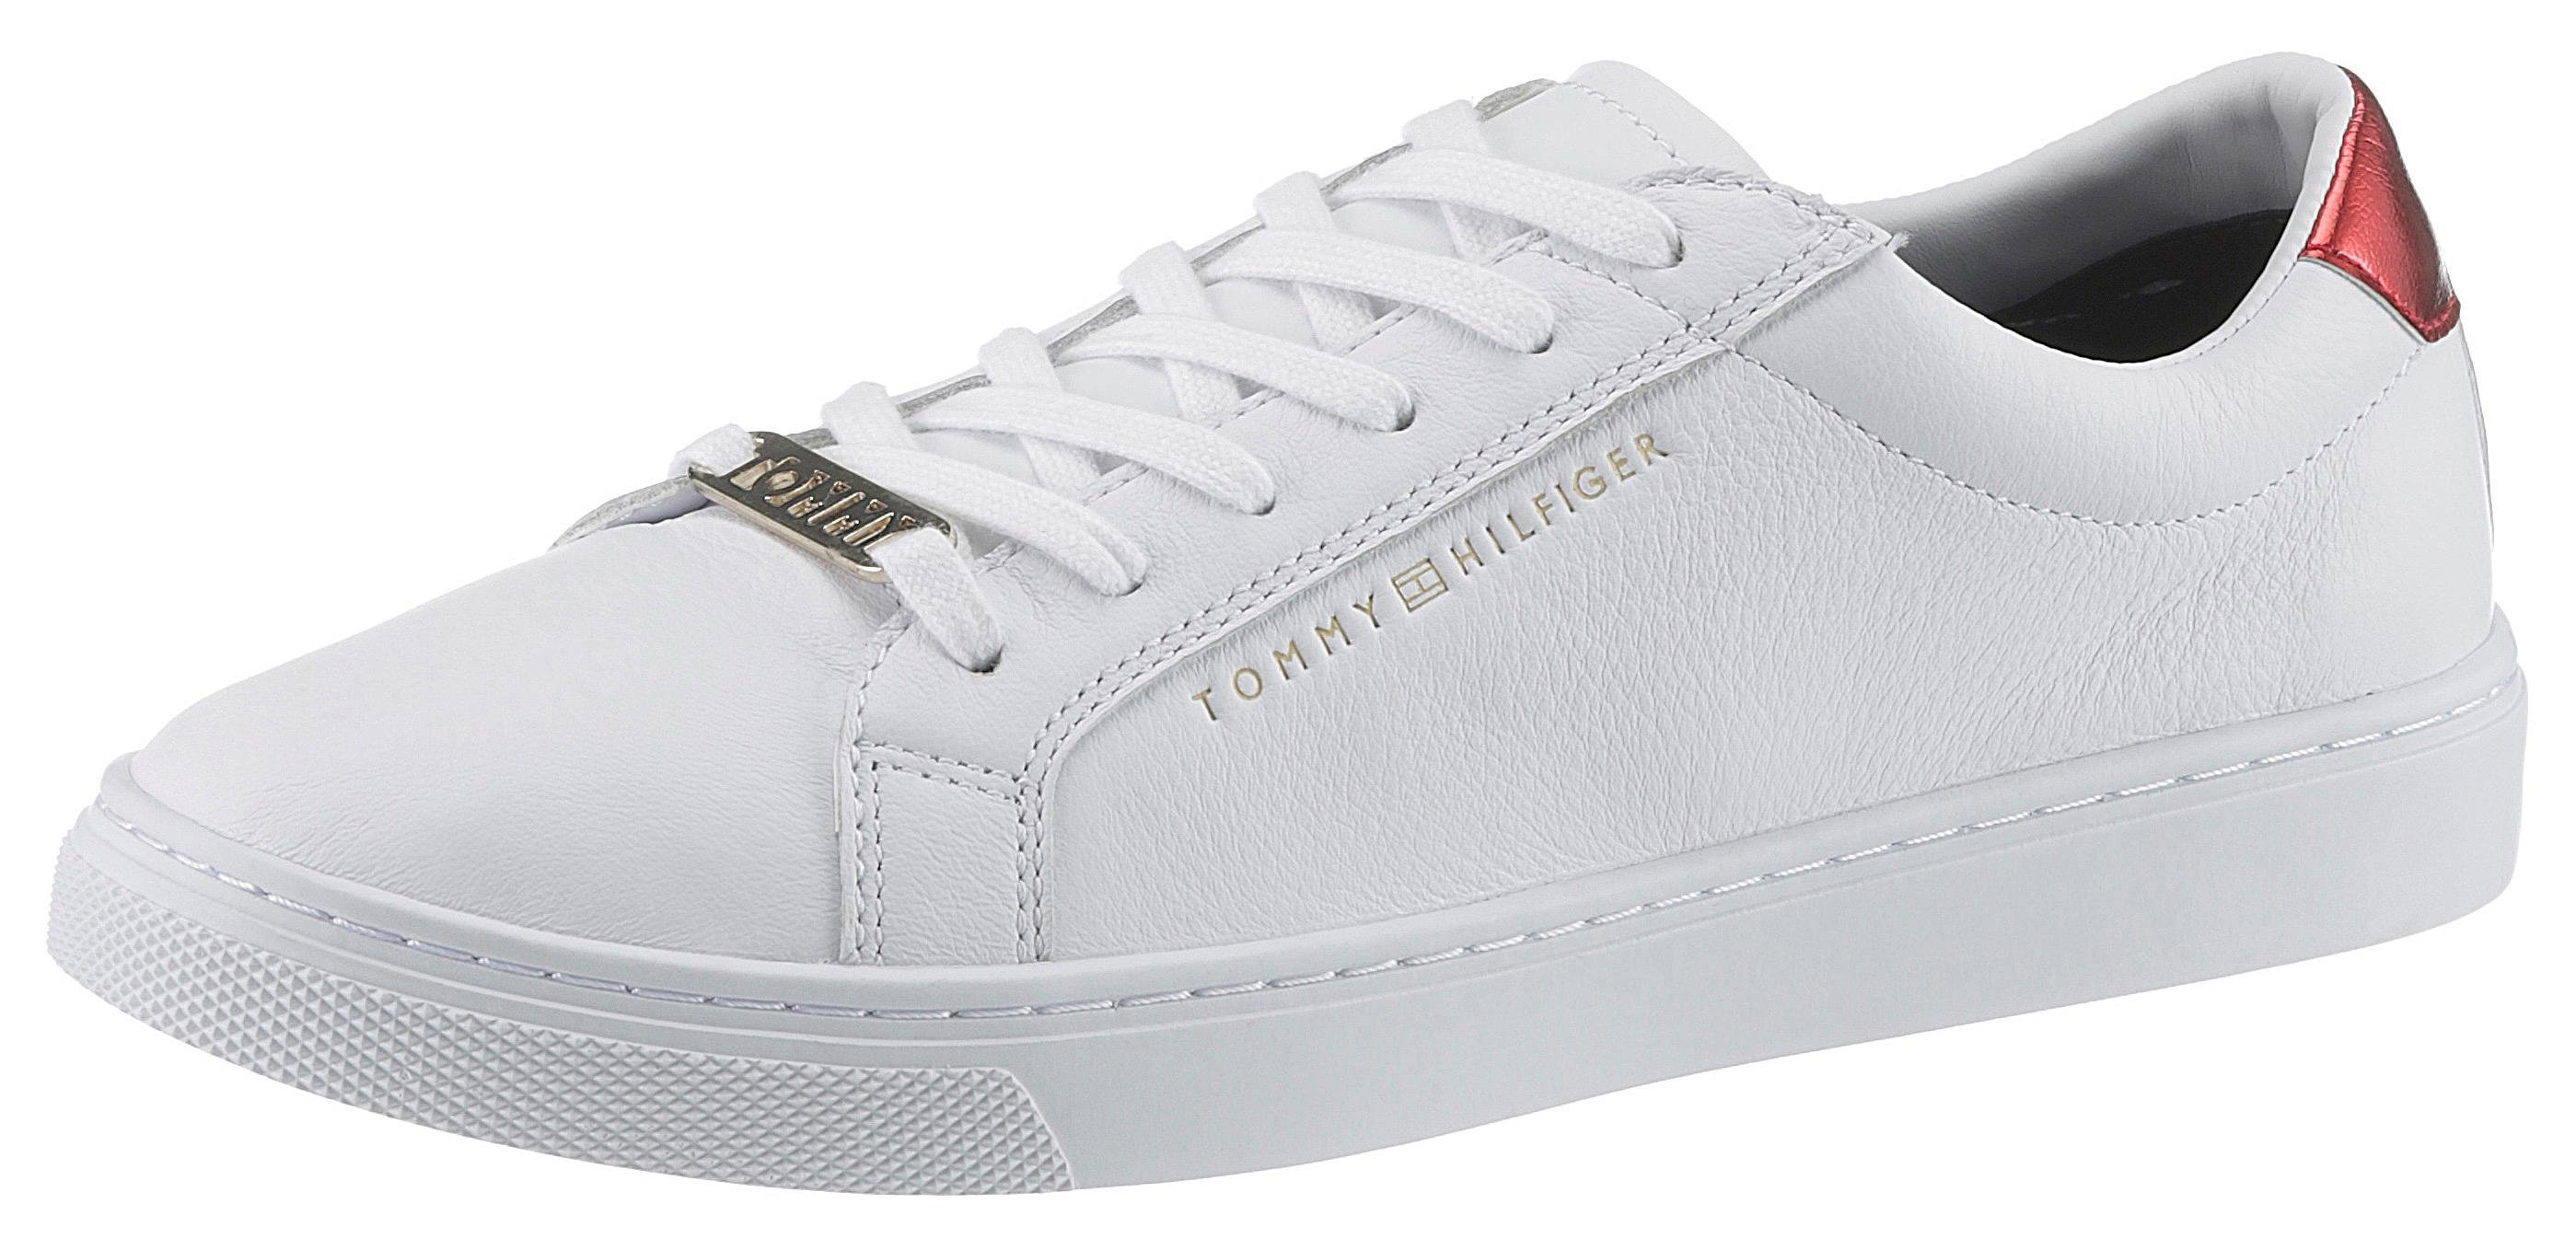 Tommy Hilfiger sneakers »Venus 22A« voordelig en veilig online kopen